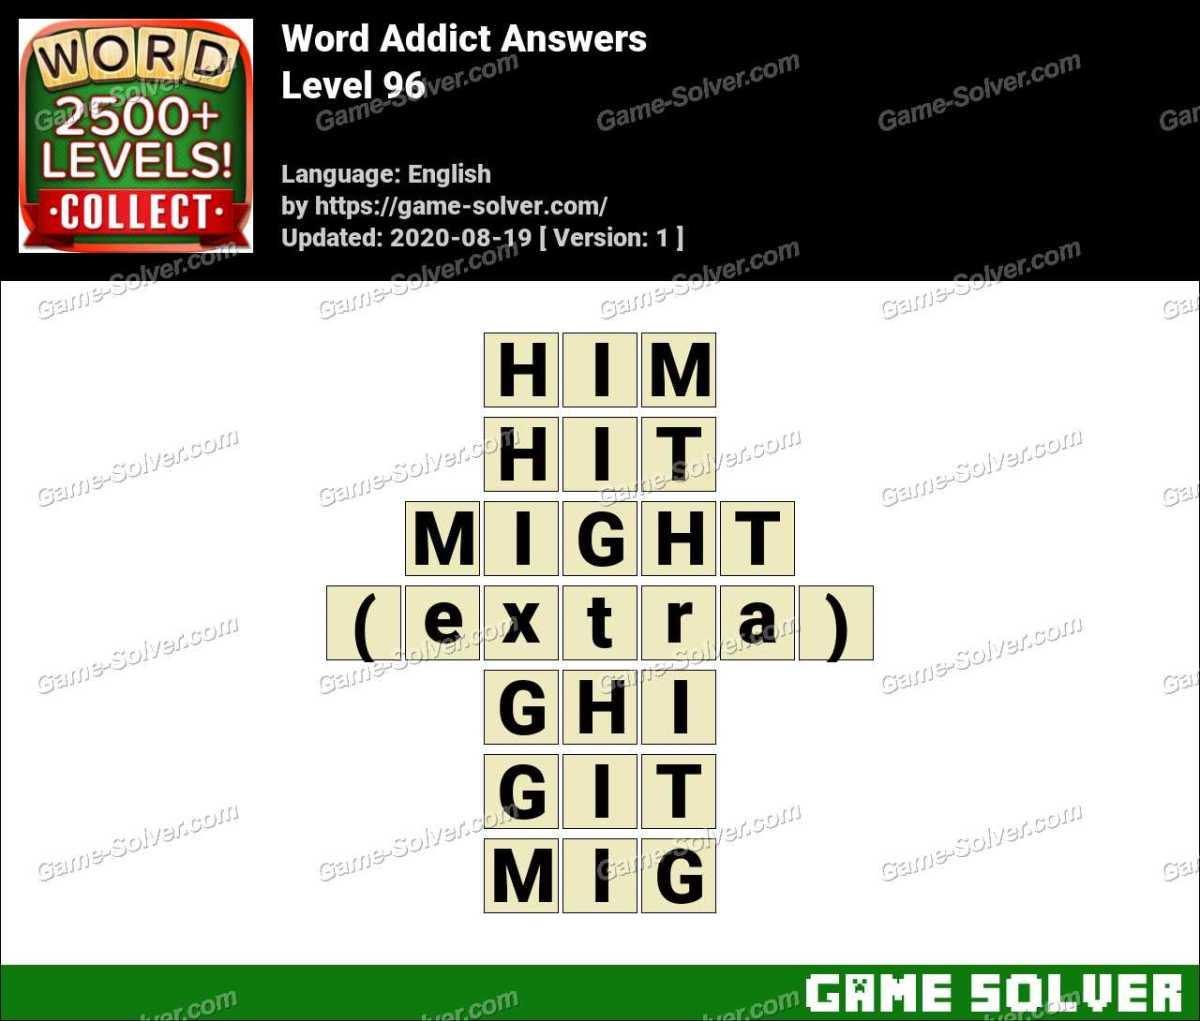 Word Addict Level 96 Answers